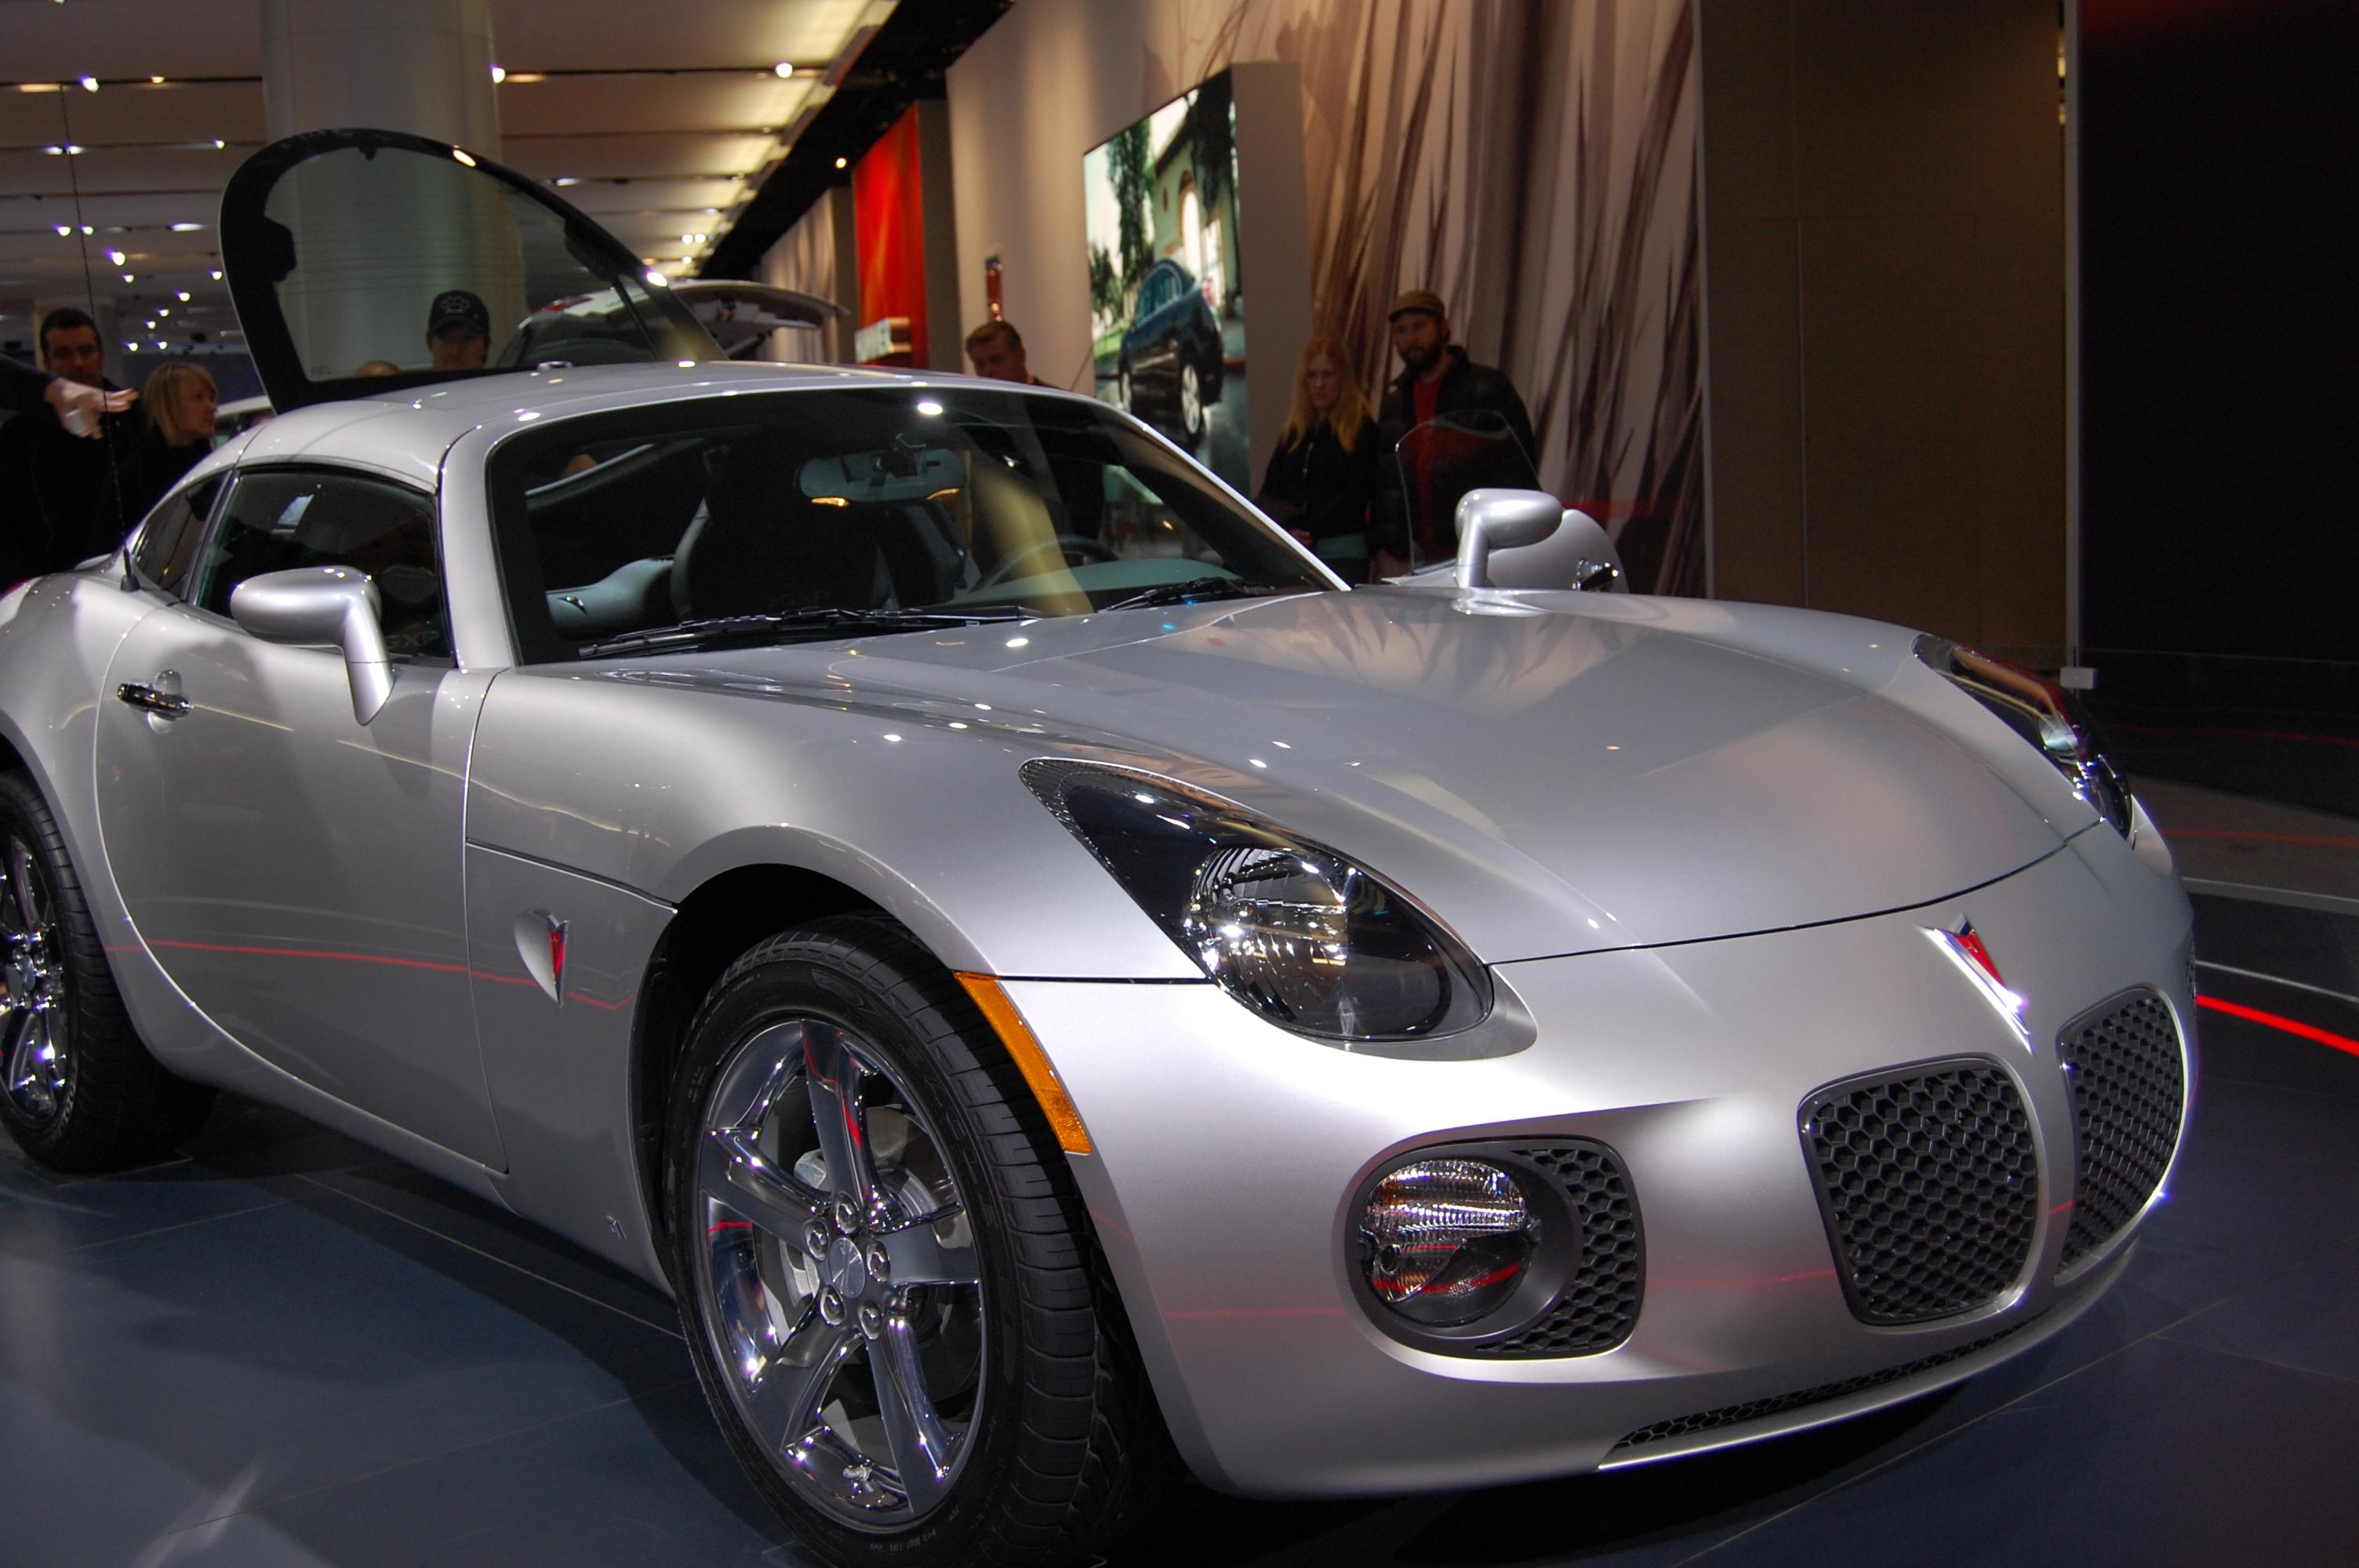 Pontiac Solstice 2005 - 2009 Cabriolet #3